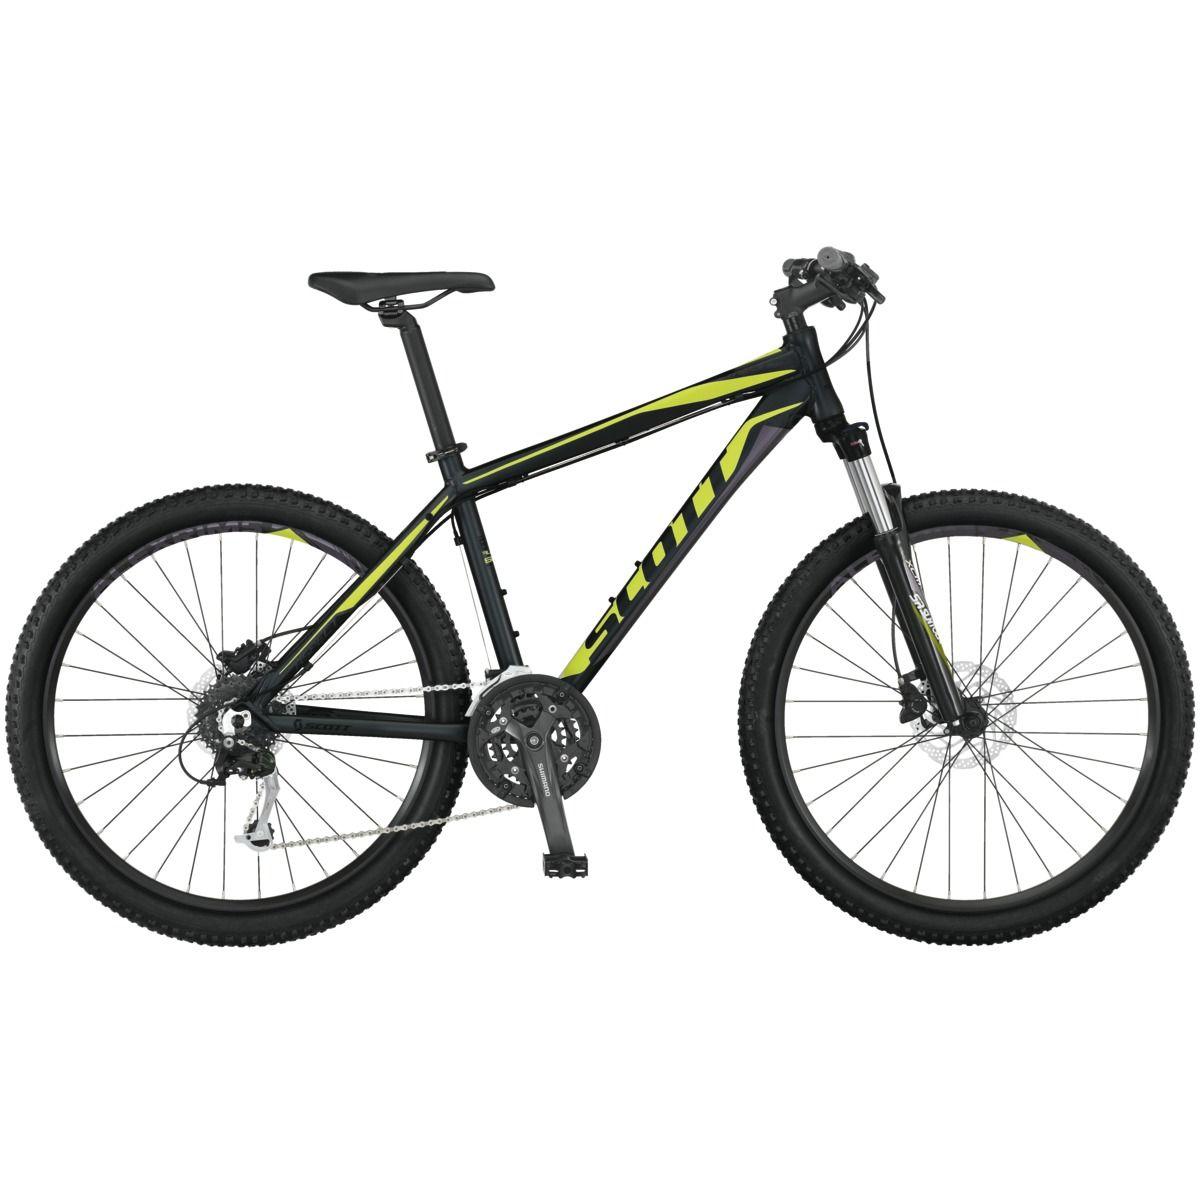 Scott Peak 640 Euro Hardtail Mountain Bike Limited Number Of